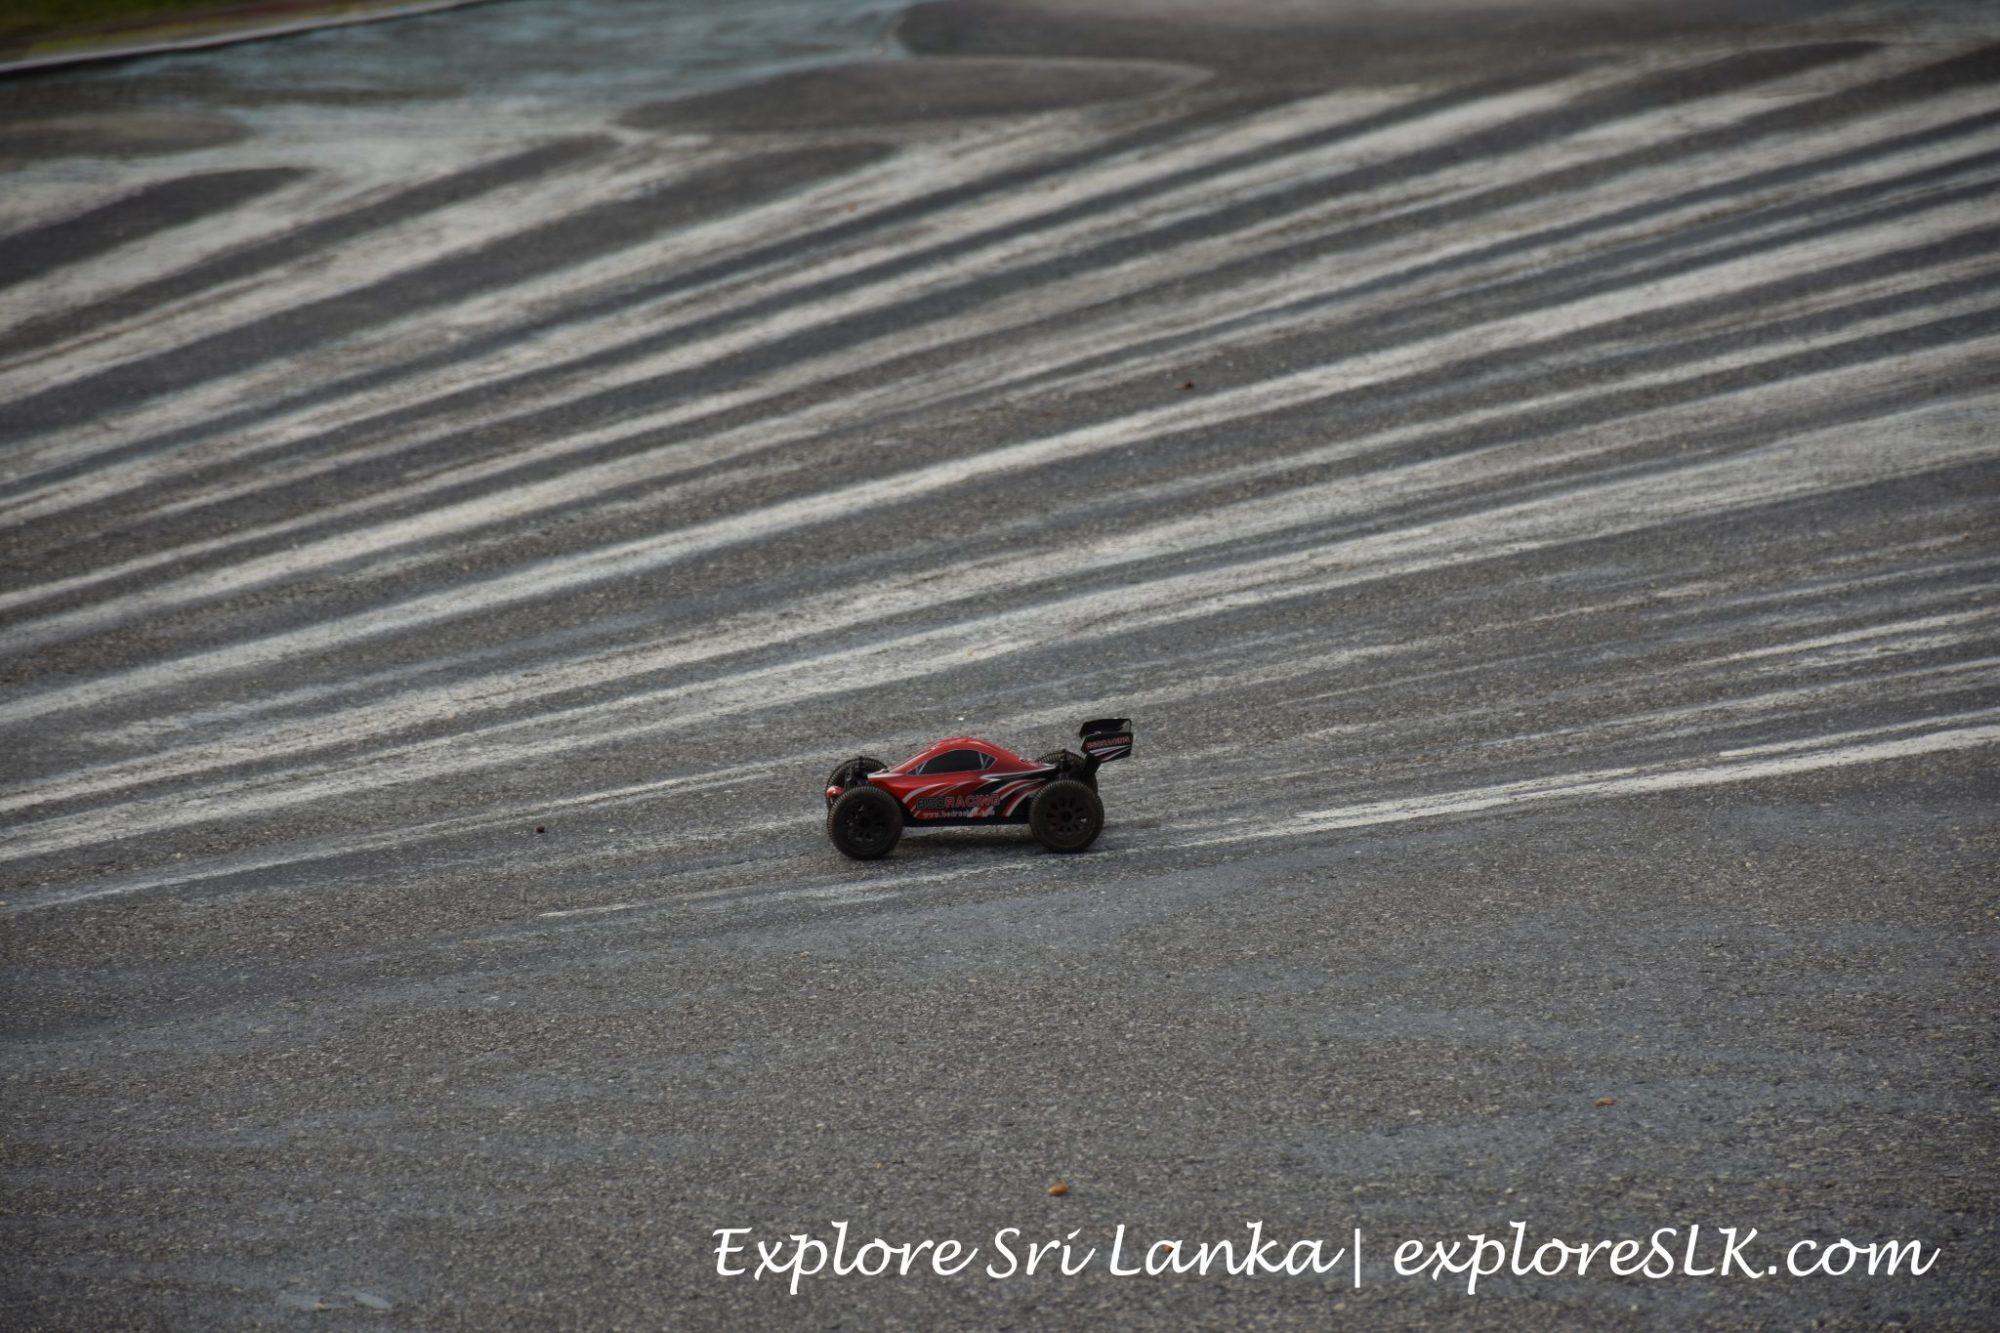 Oh..! A street racer